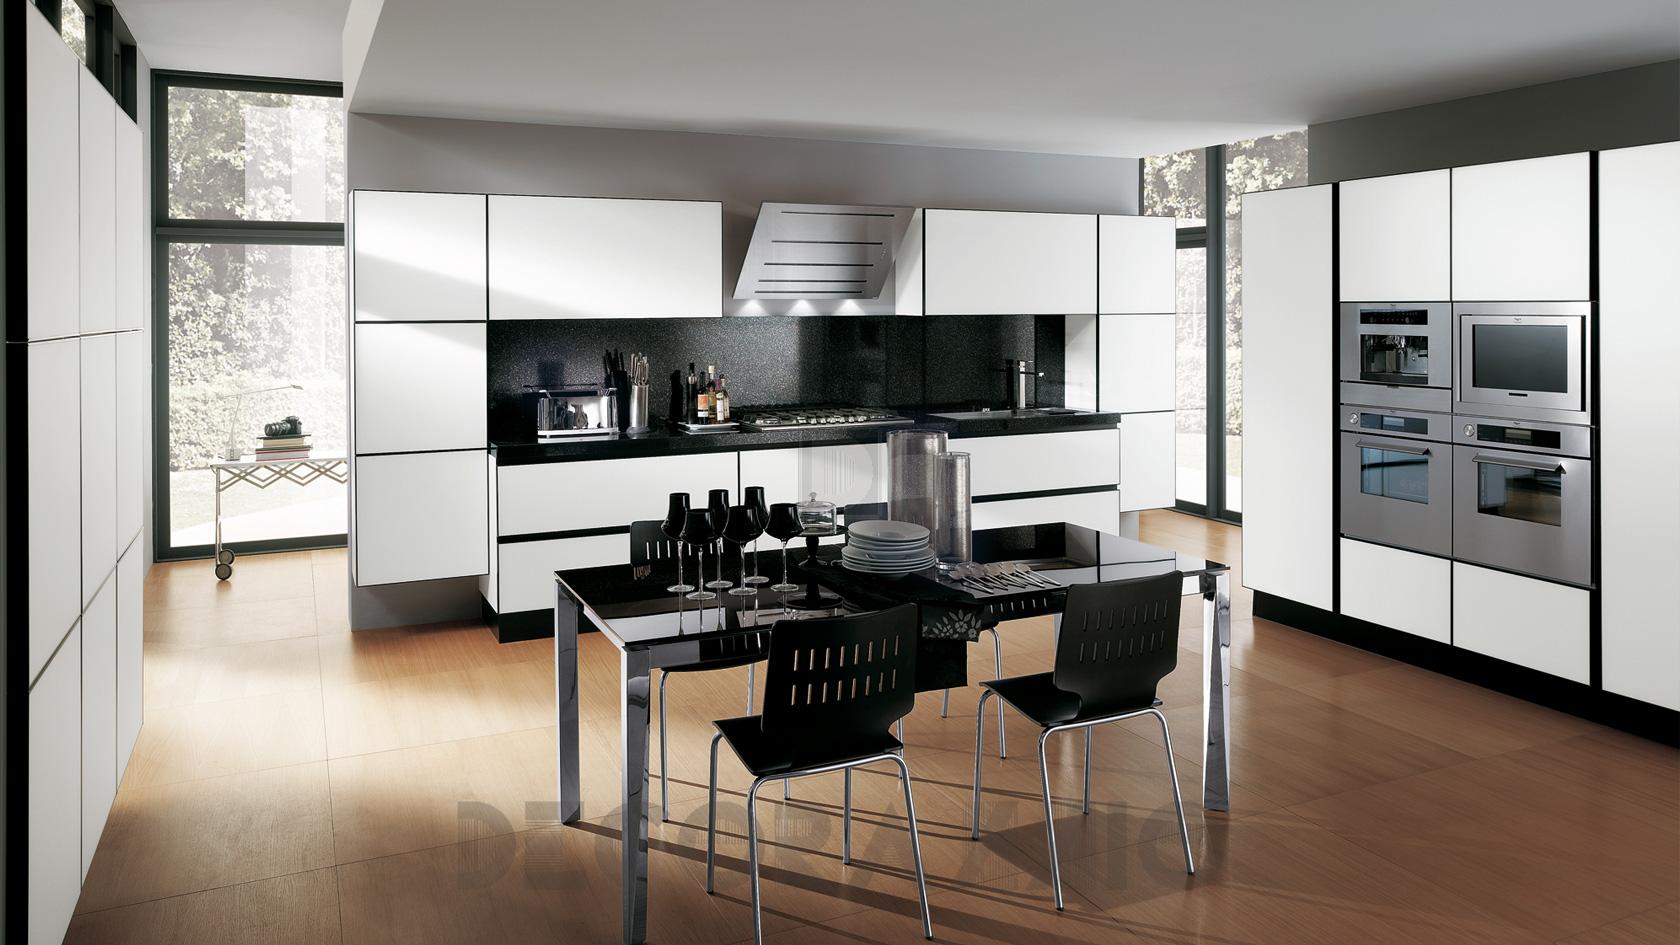 Кухня дизайн интерьер фото 2016-2017